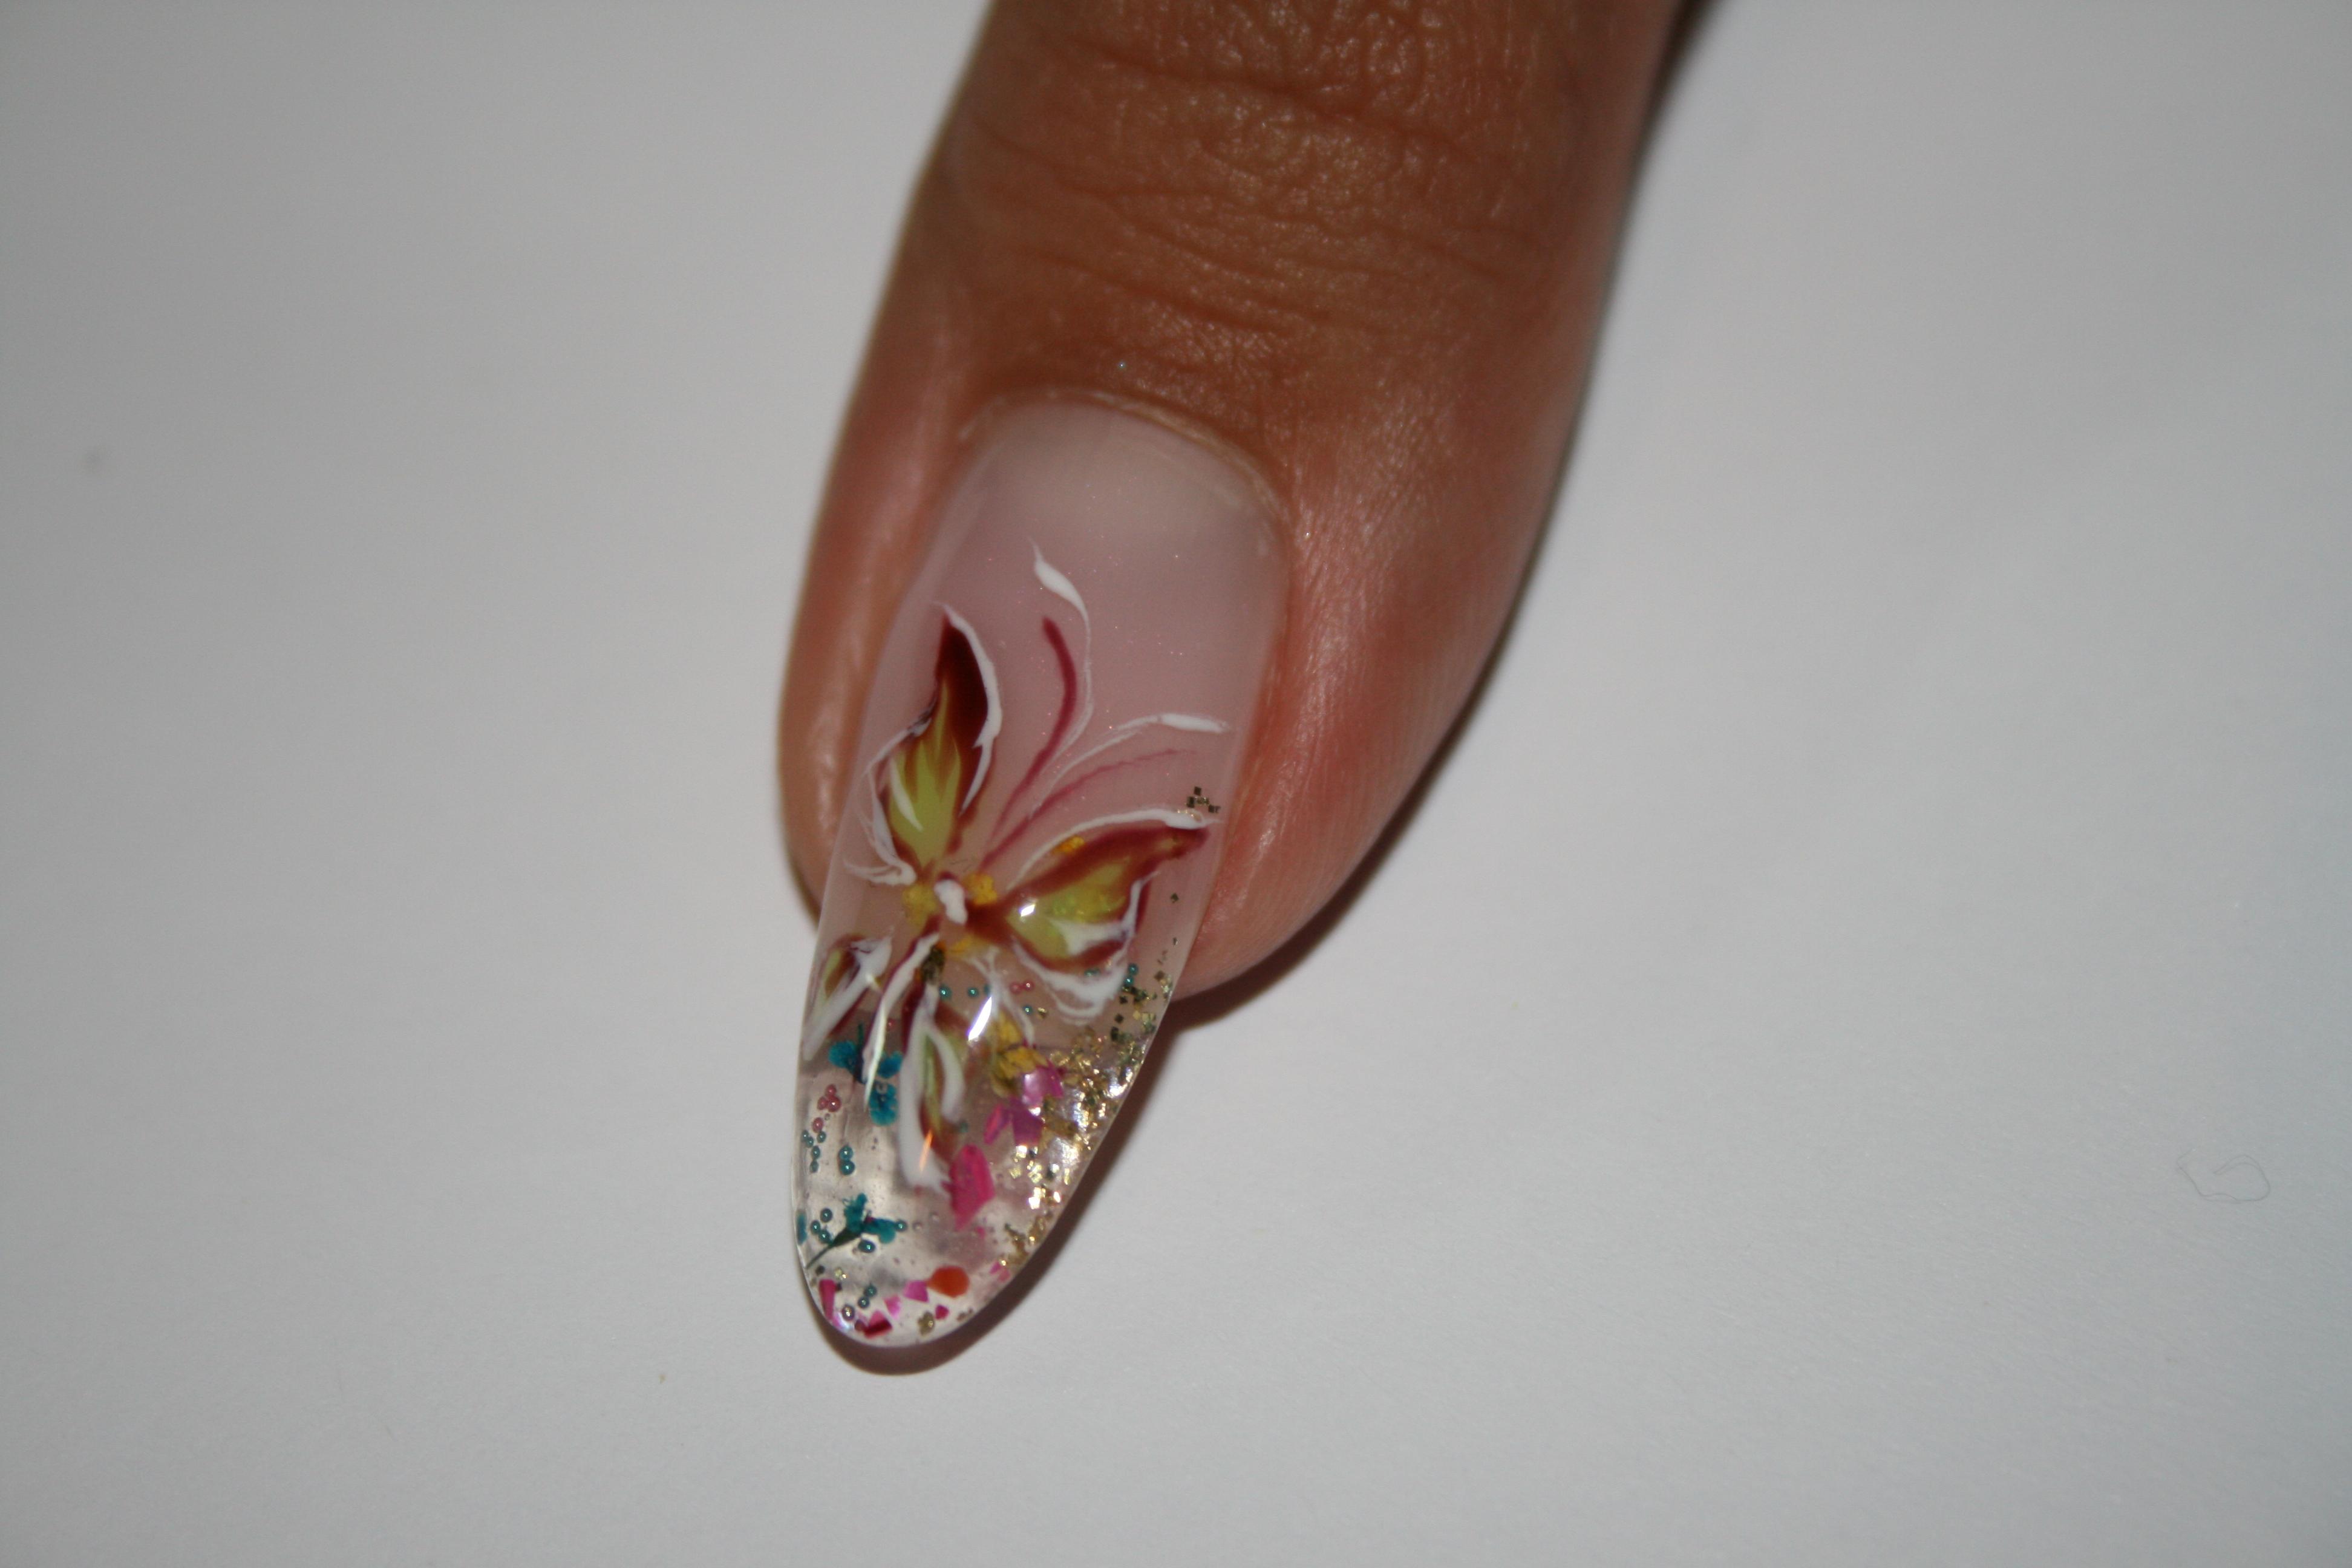 дизайн гелевых ногтей фото новинки ...: design.bigbo.ru/?p=2571